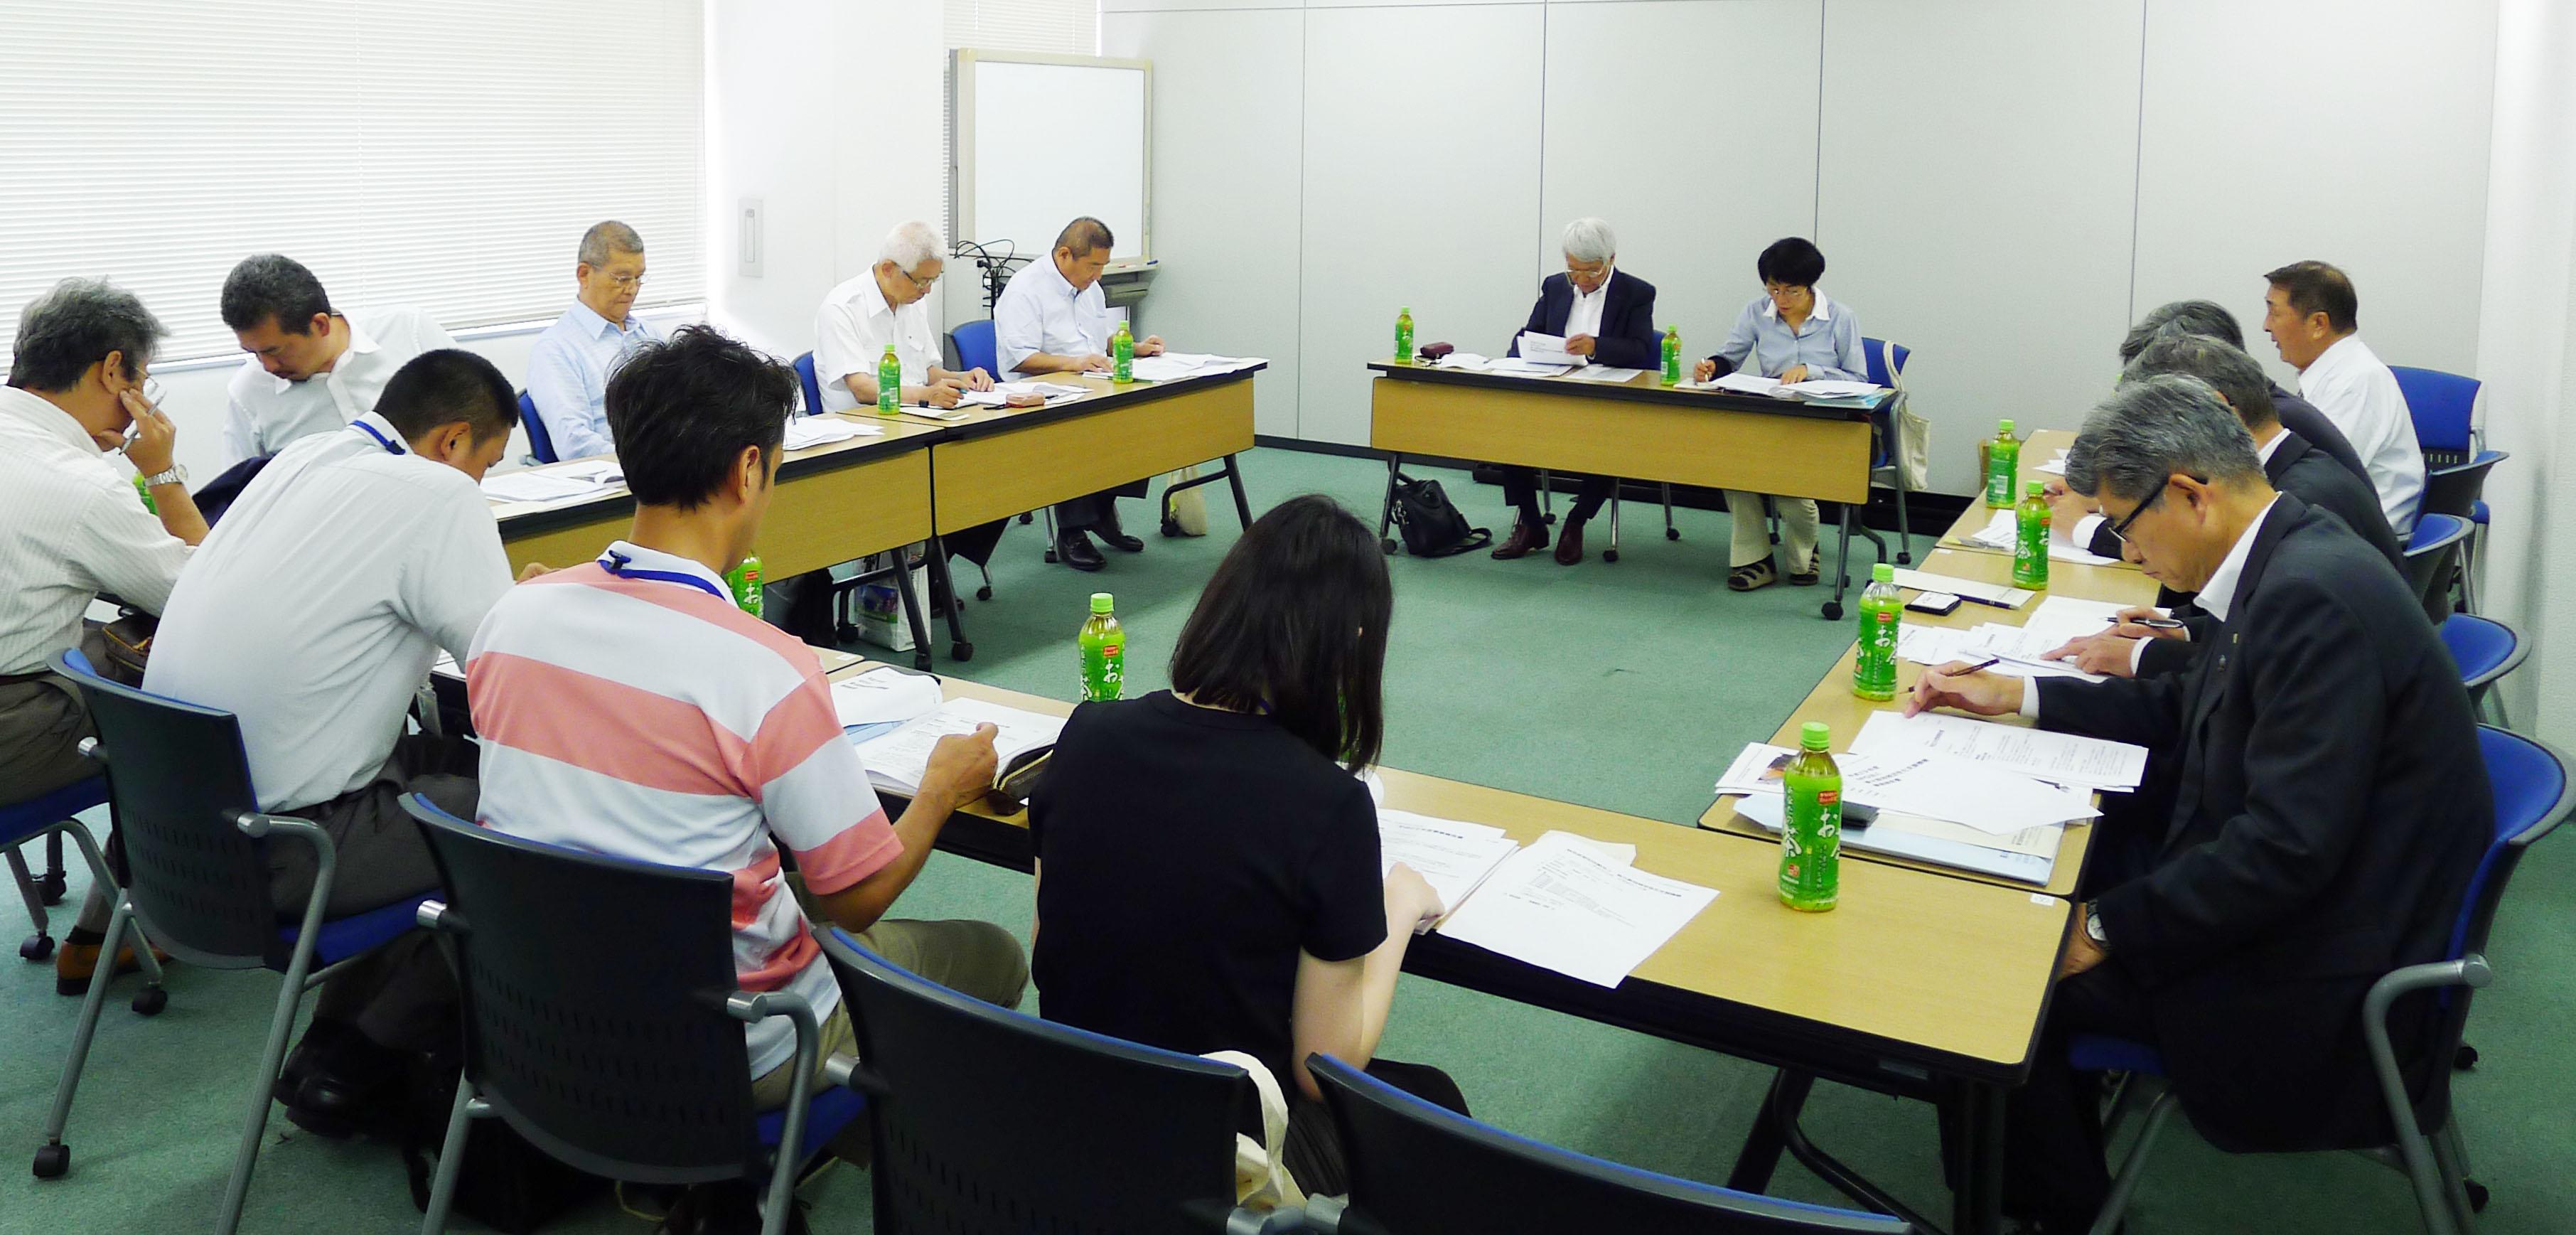 【参加者募集】10/4(木)東大阪発!働き方改革プロジェクト意見交換会